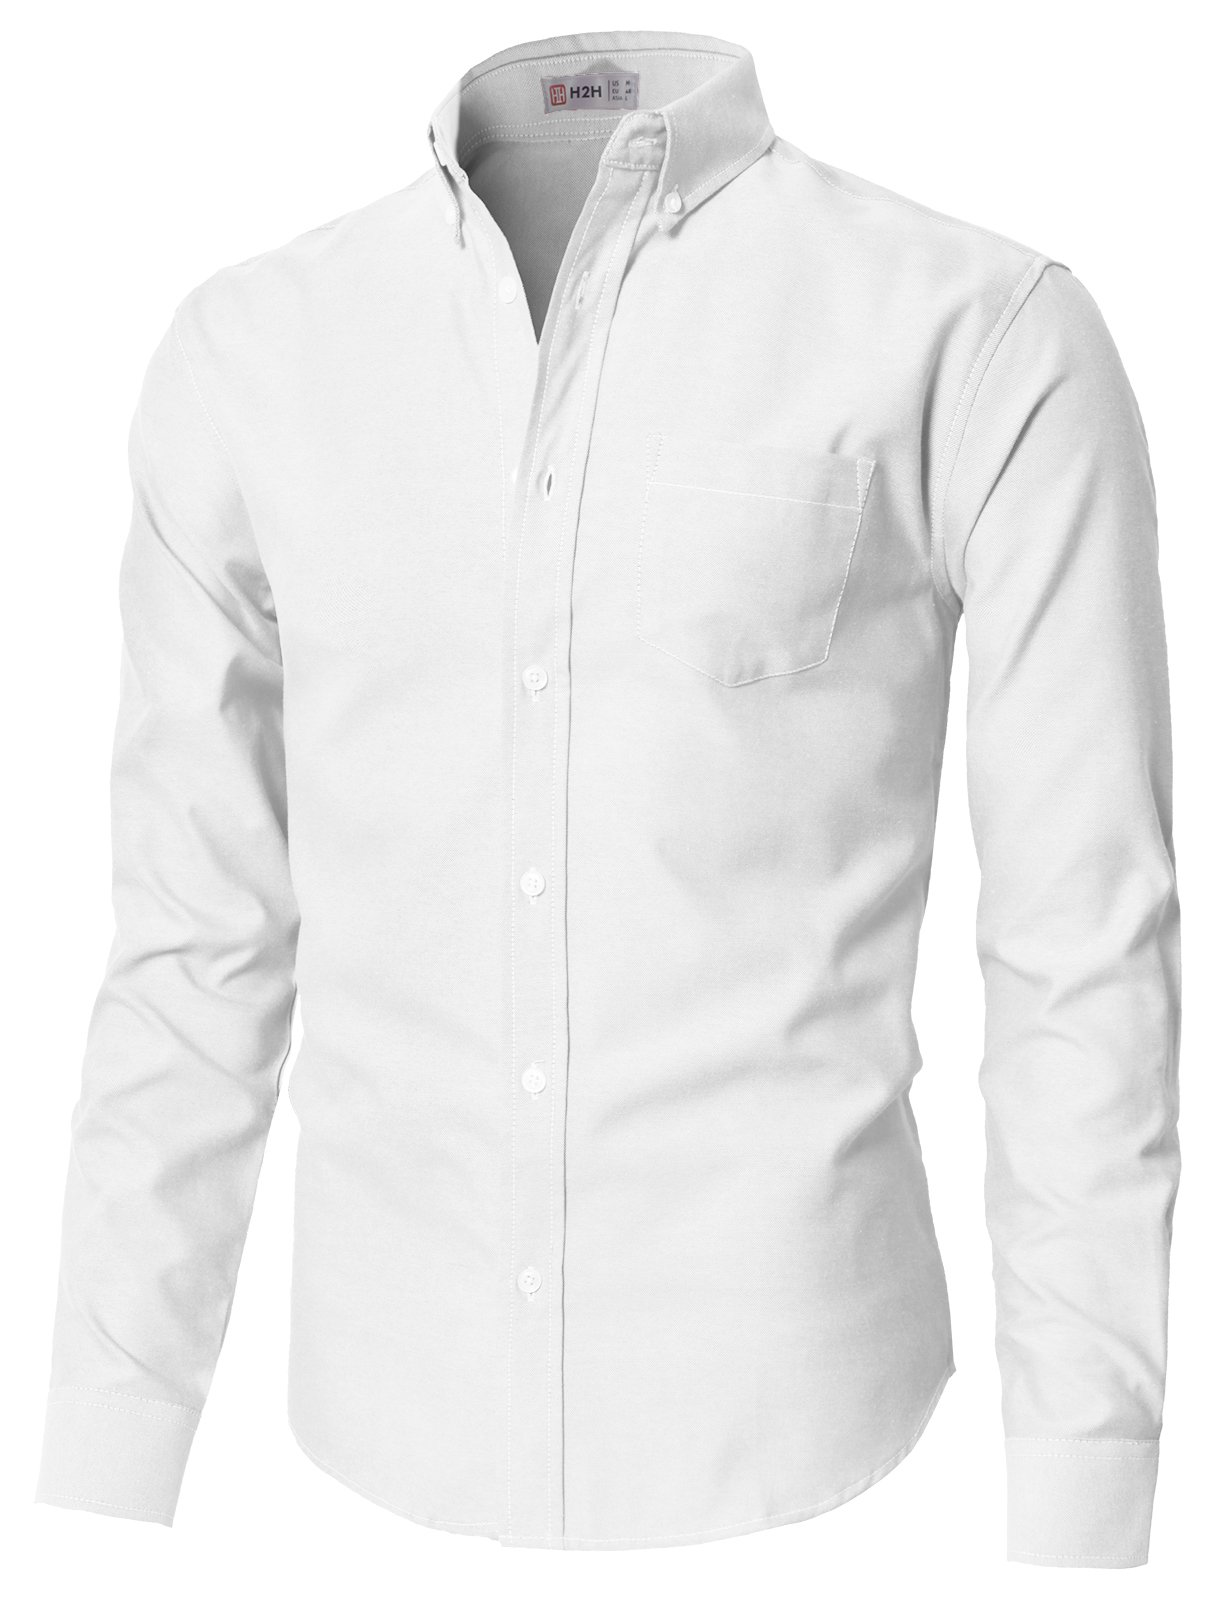 H2H Men's Solid Color 100% Cotton Oxford Long Sleeve Button Down Casual Shirt White US L/Asia XL (KMTSTL0521)